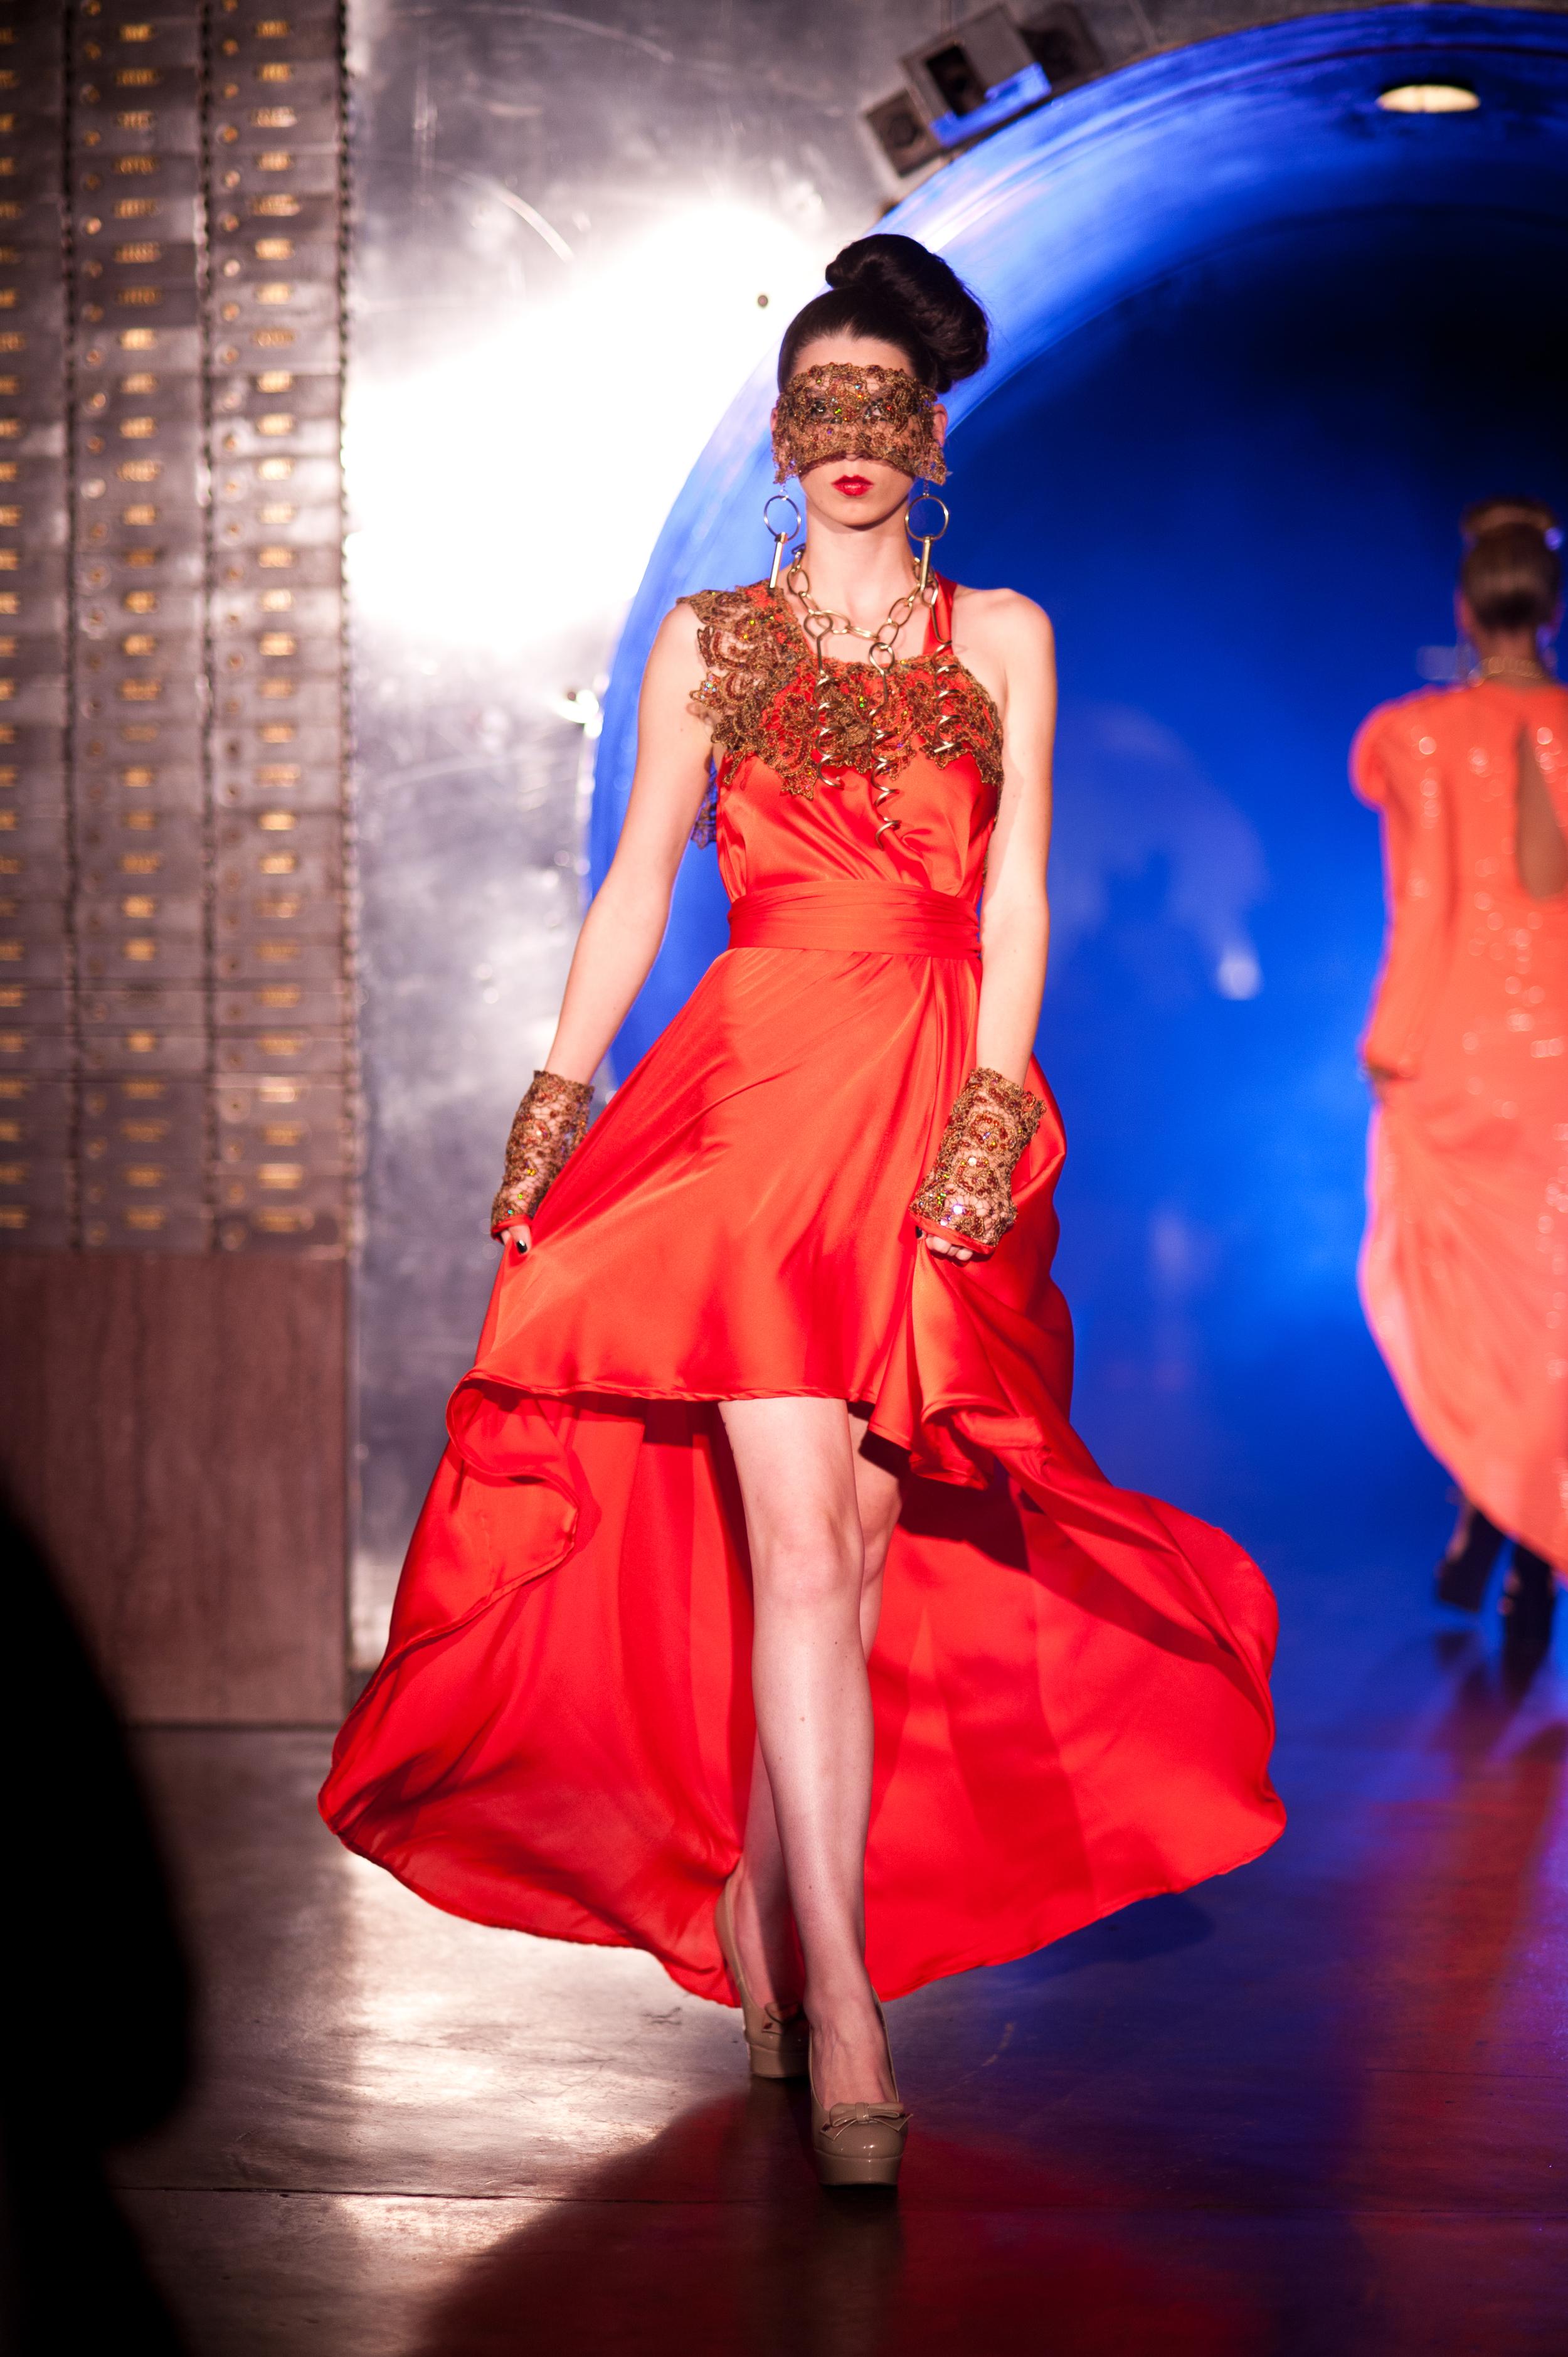 Model: Anna Poston    Photo credit: David Kilper